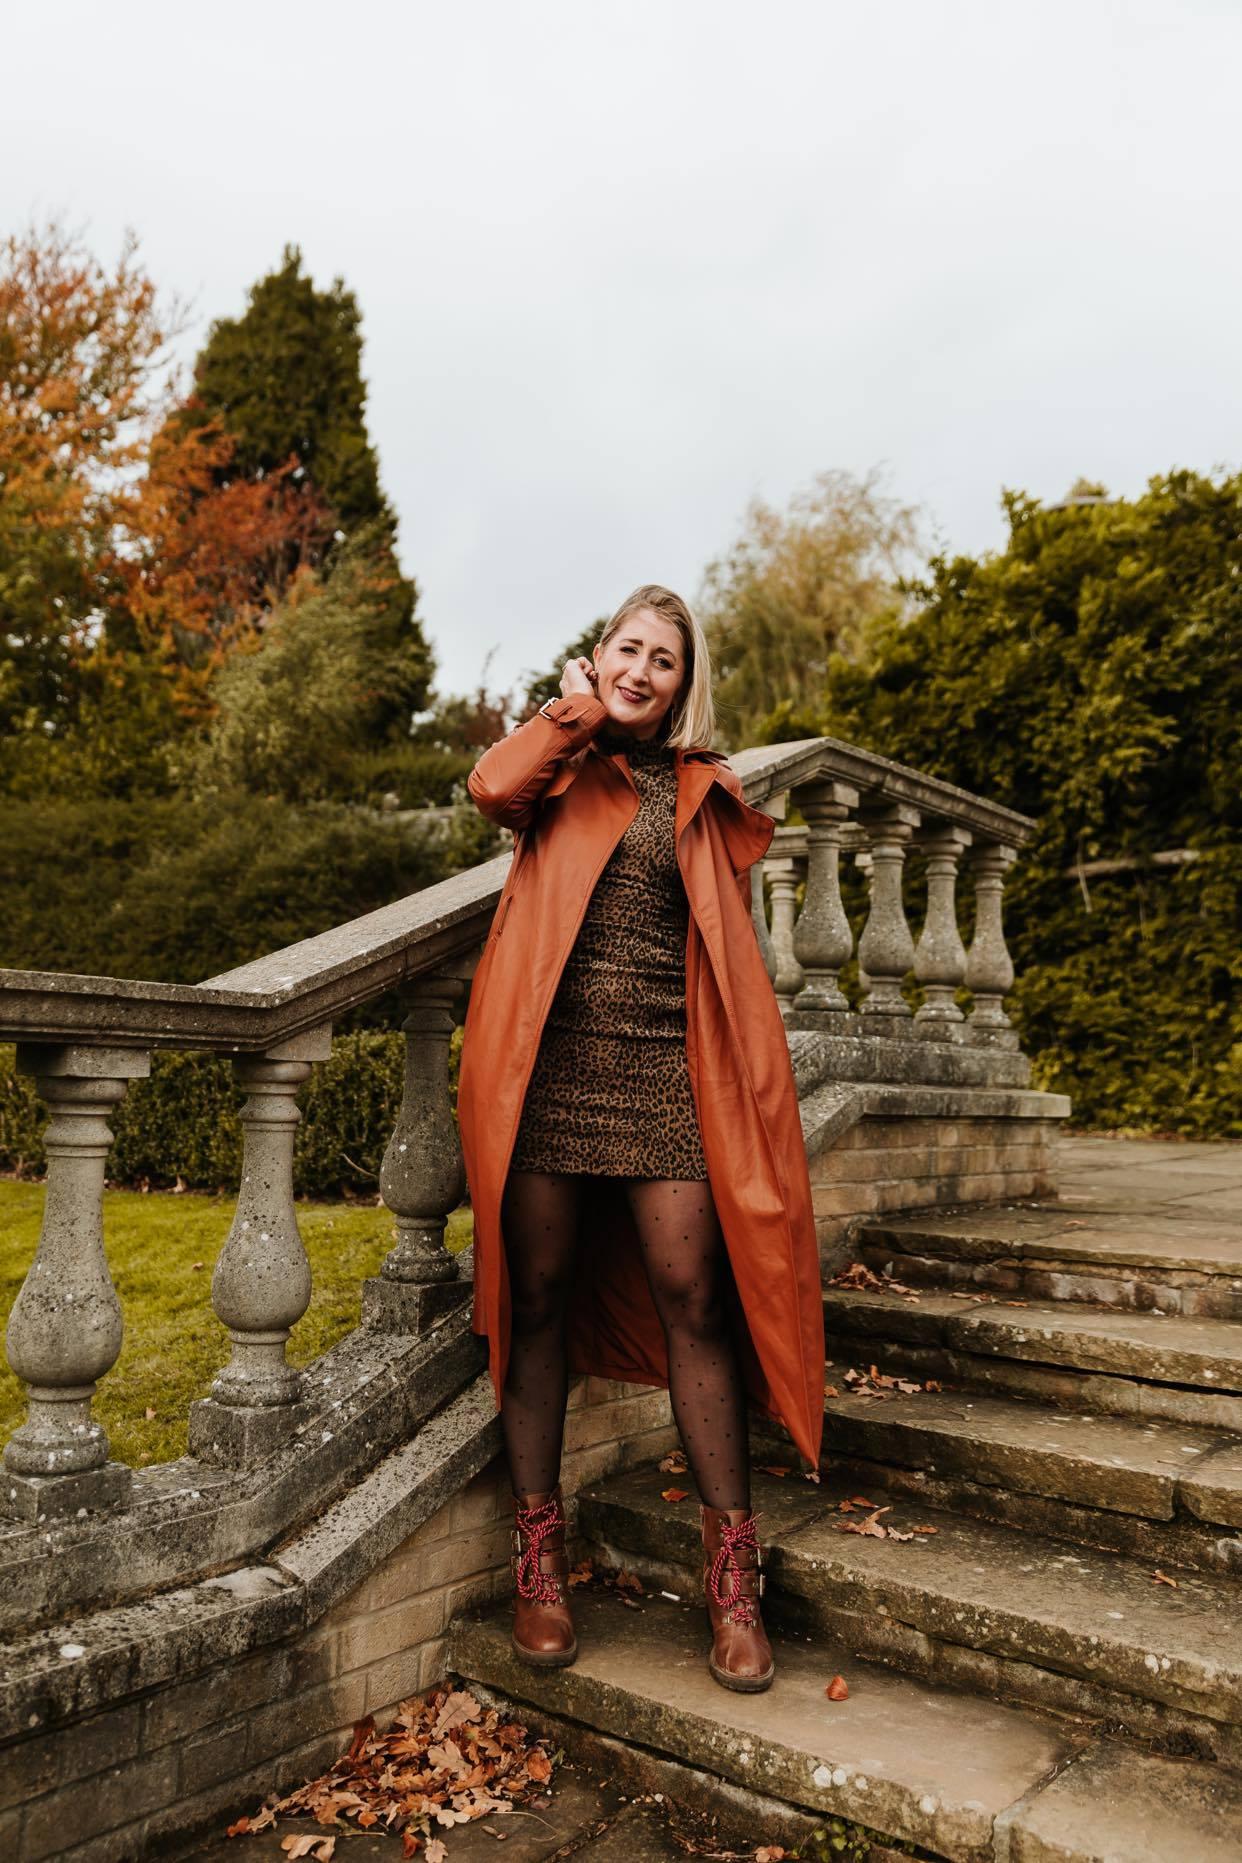 Sarah Lilly: Stylist & Deputy Manager